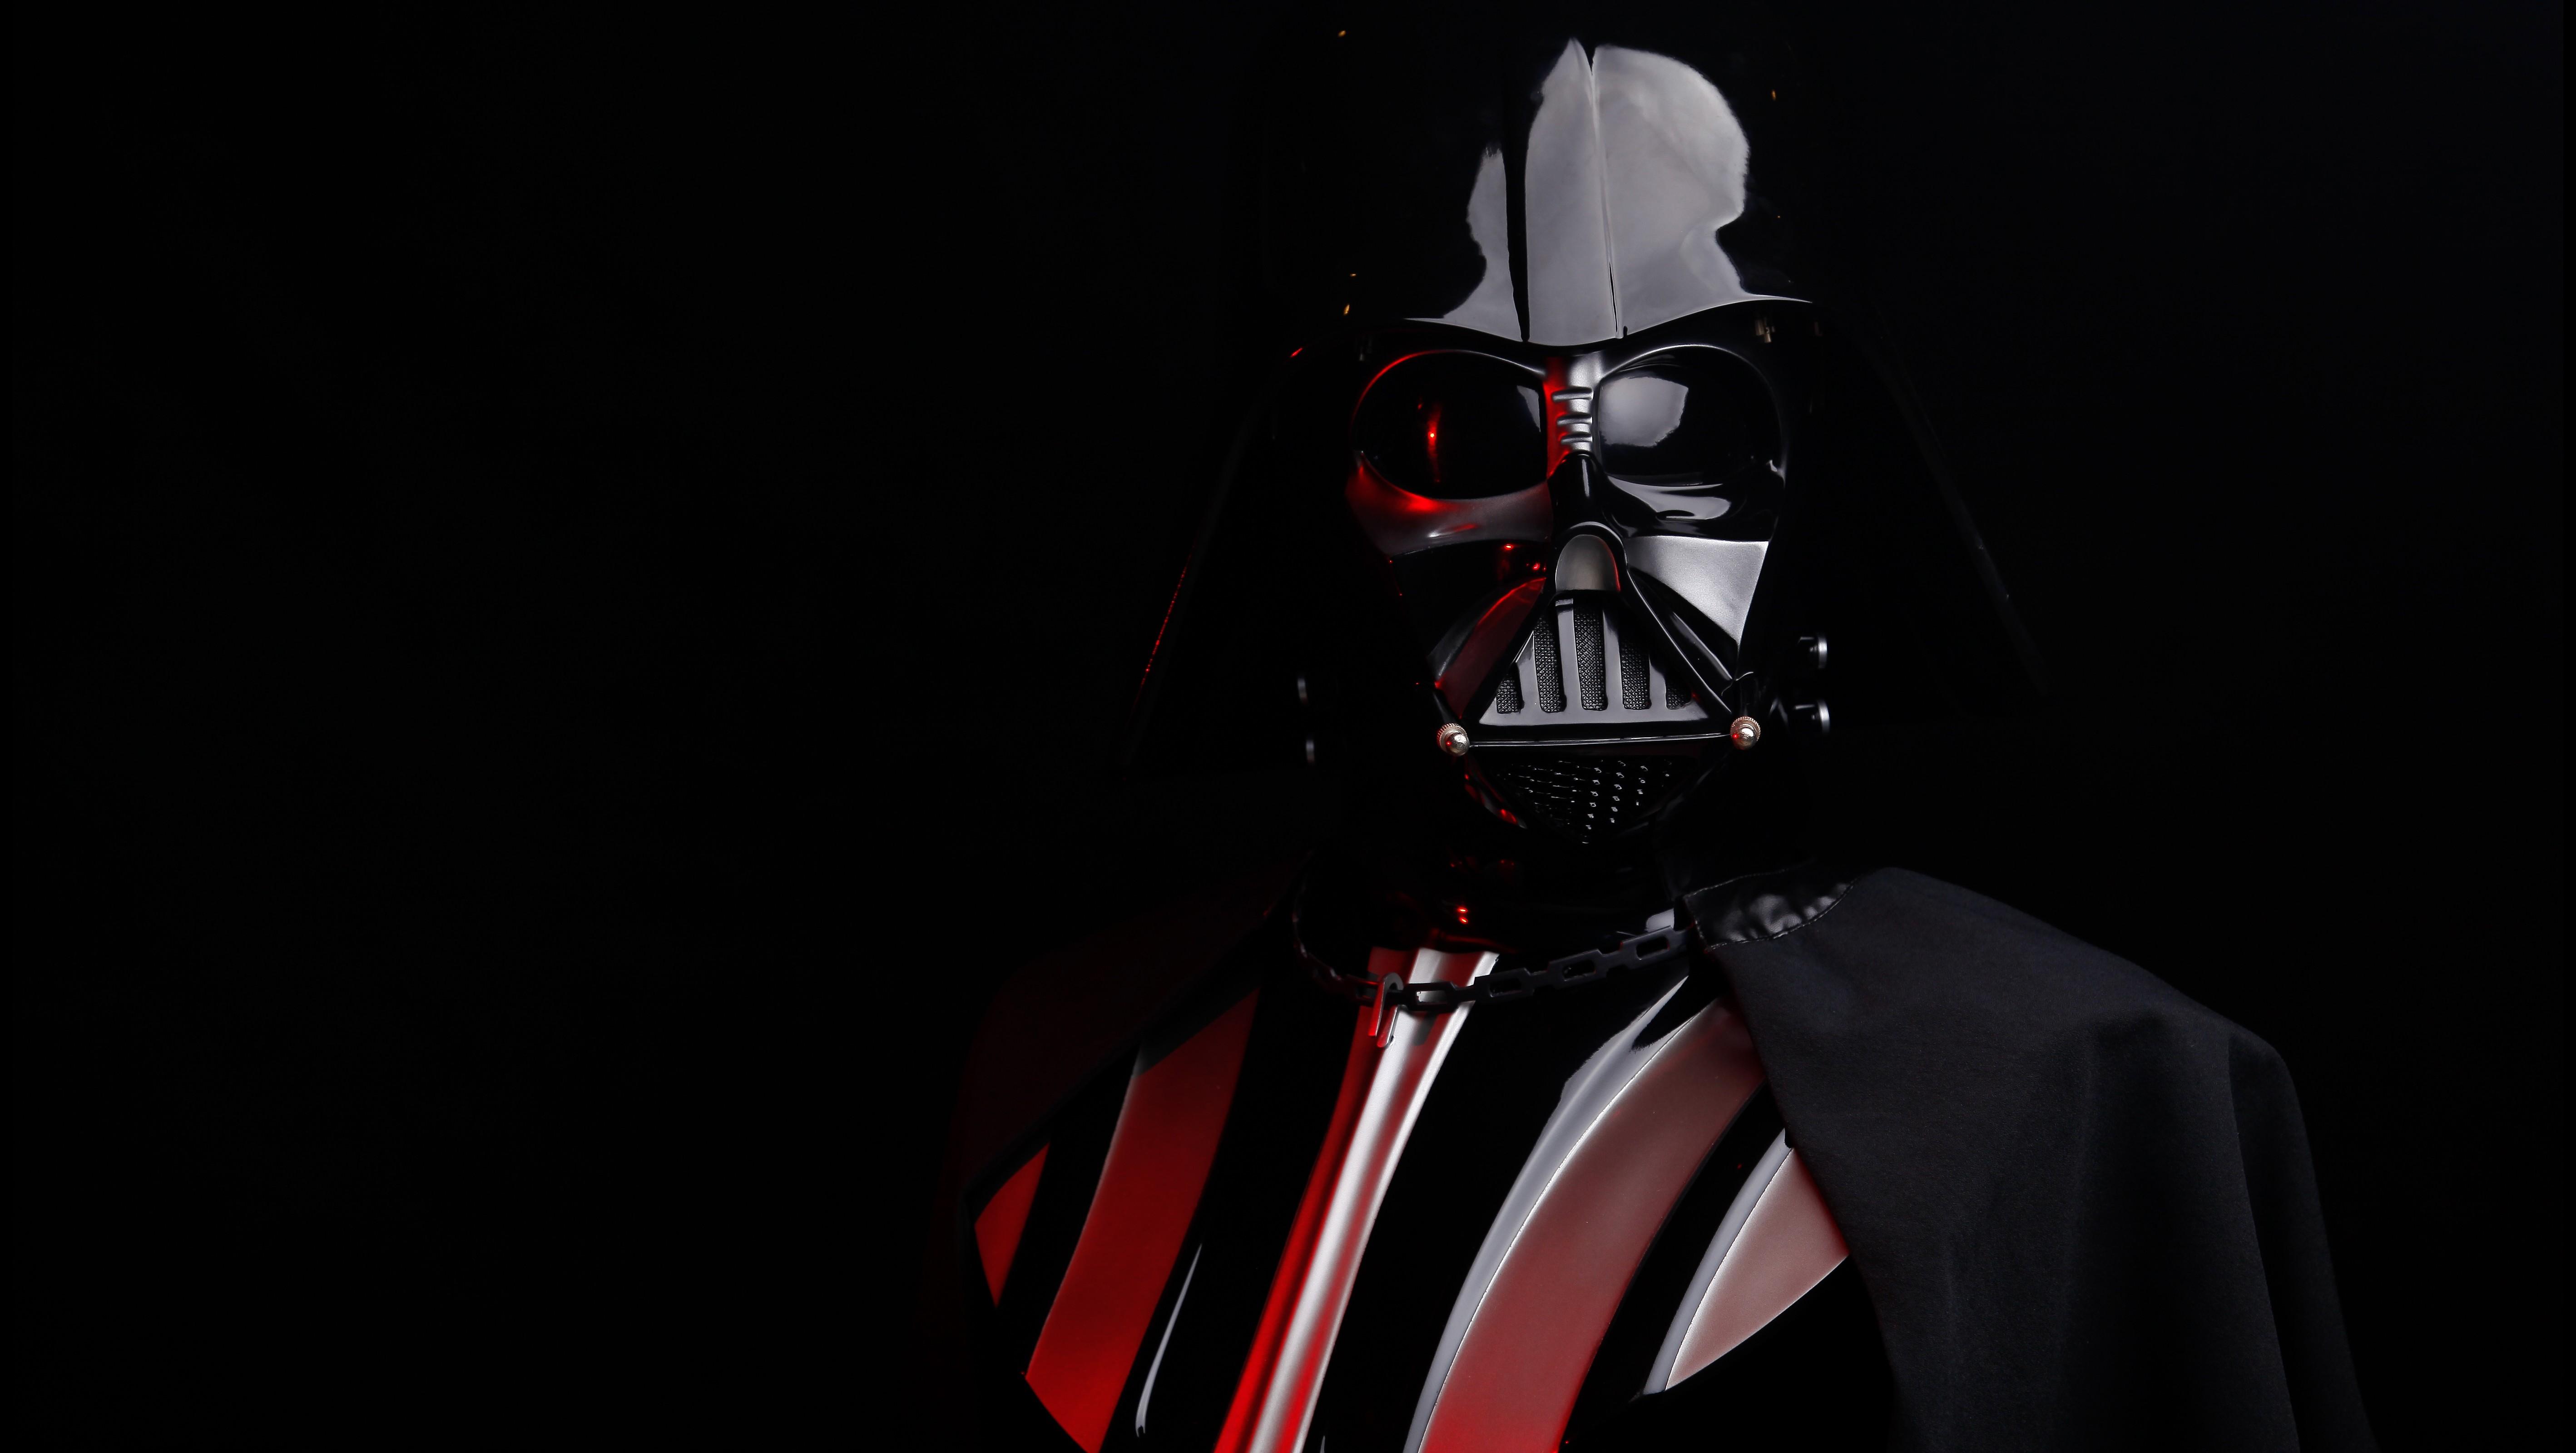 Wallpaper Black Star Wars Red Sith Darth Vader Clothing Darkness Costume 5672x3200 Jeko98 91294 Hd Wallpapers Wallhere